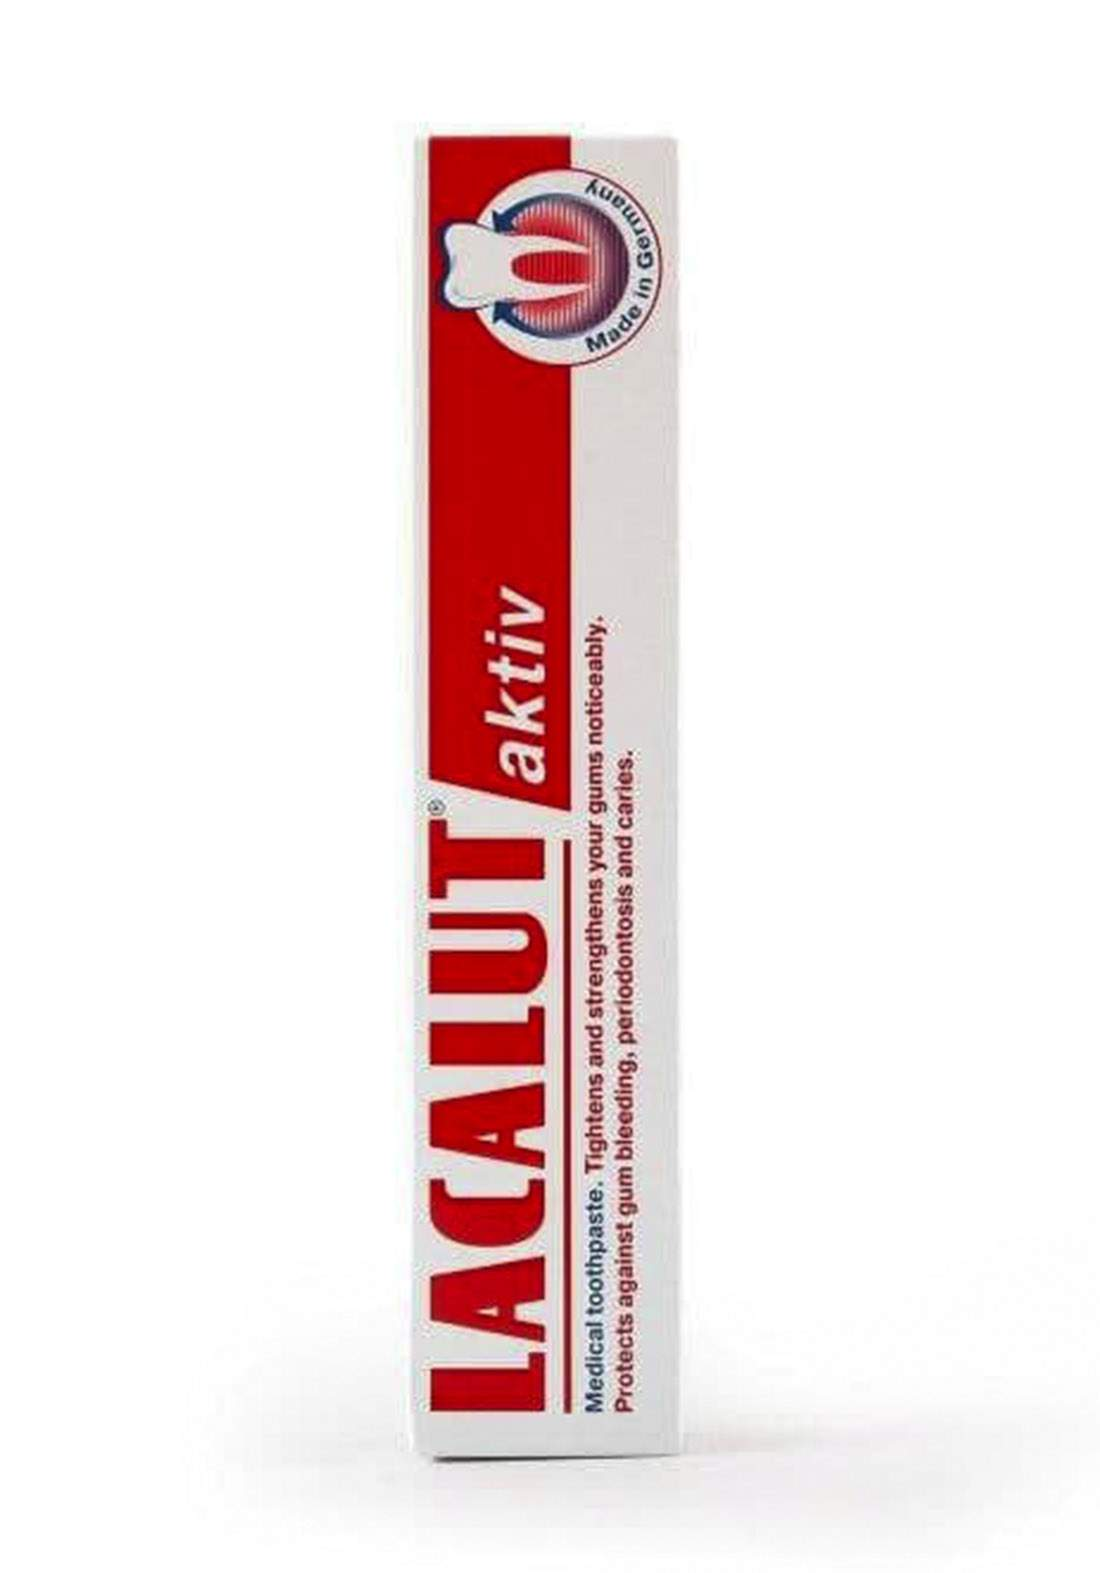 Lacalut Aktiv Toothpaste 75ml معجون الأسنان